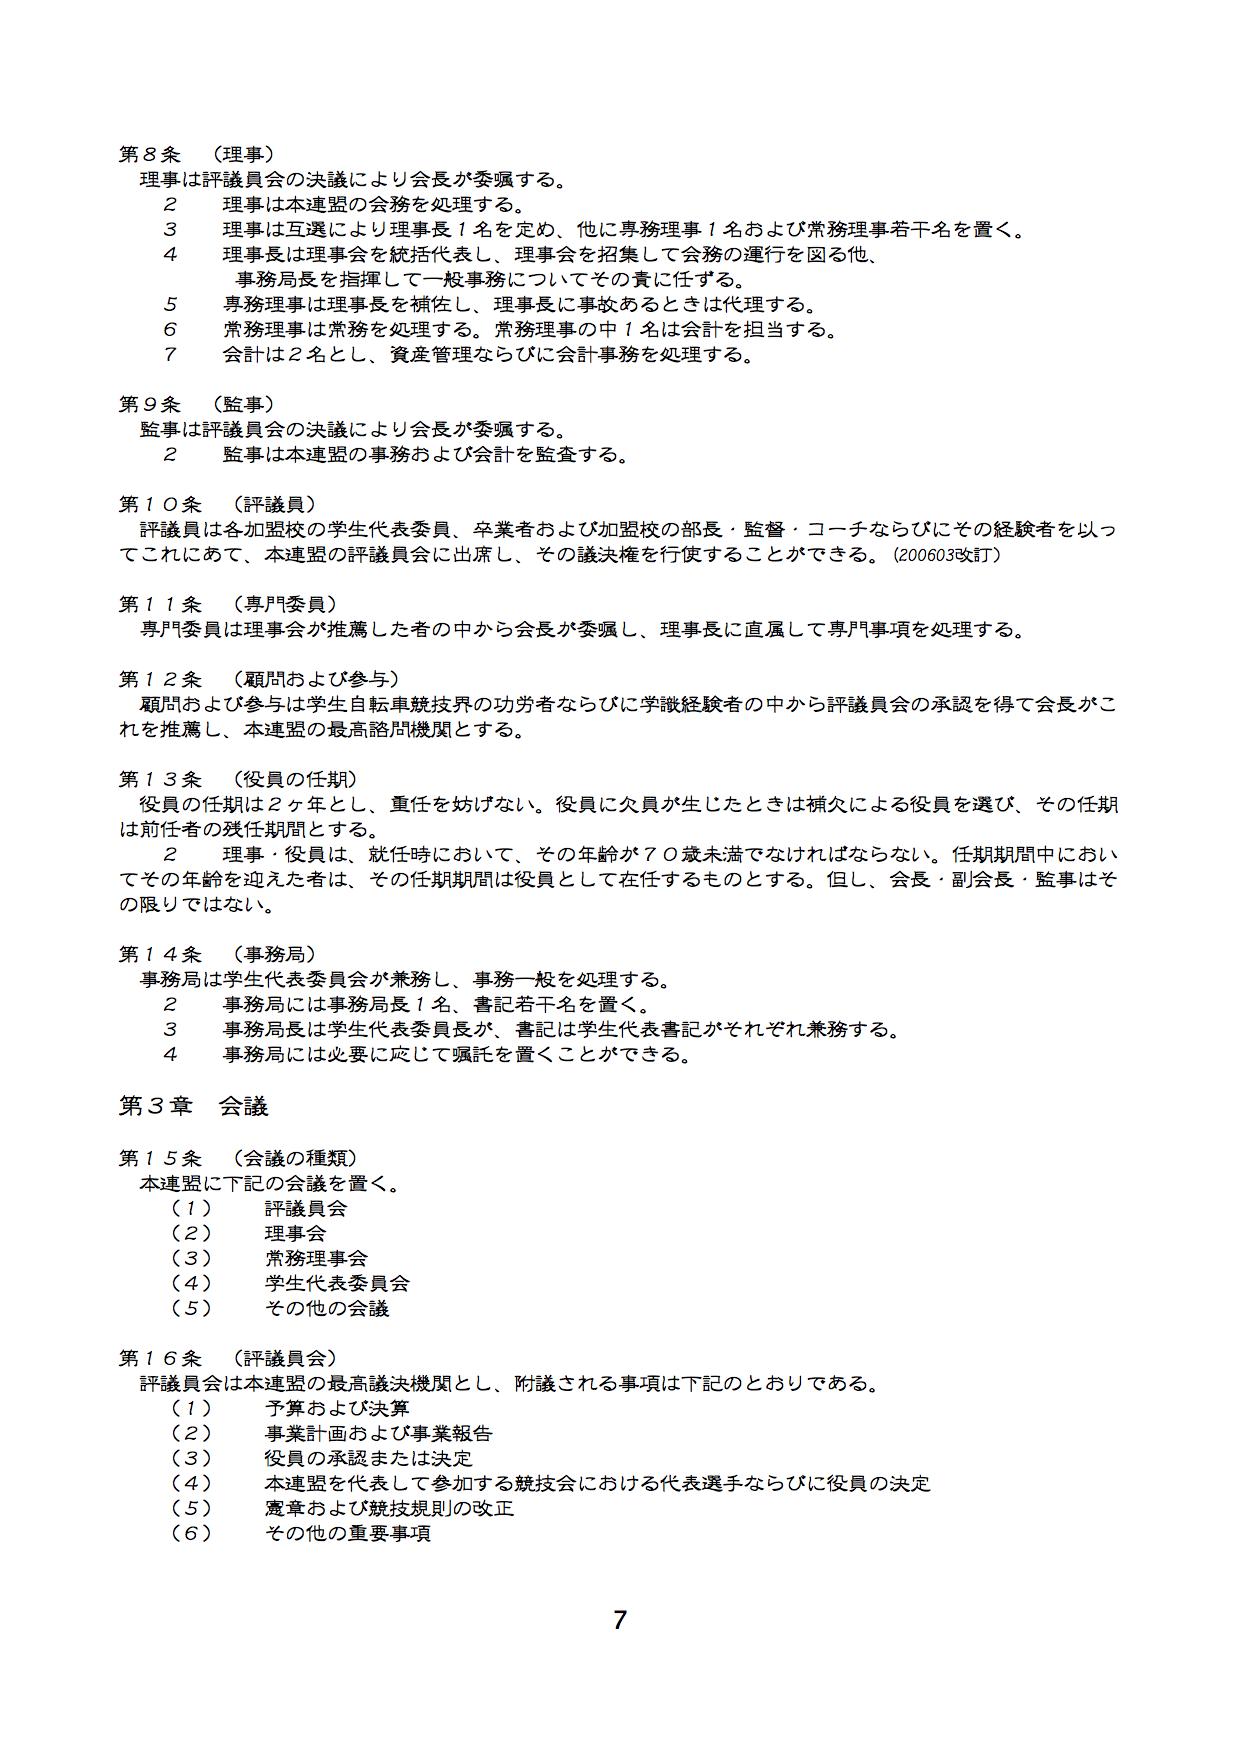 15jicf_gakuren_annai_150621_jicf_kensho_00002